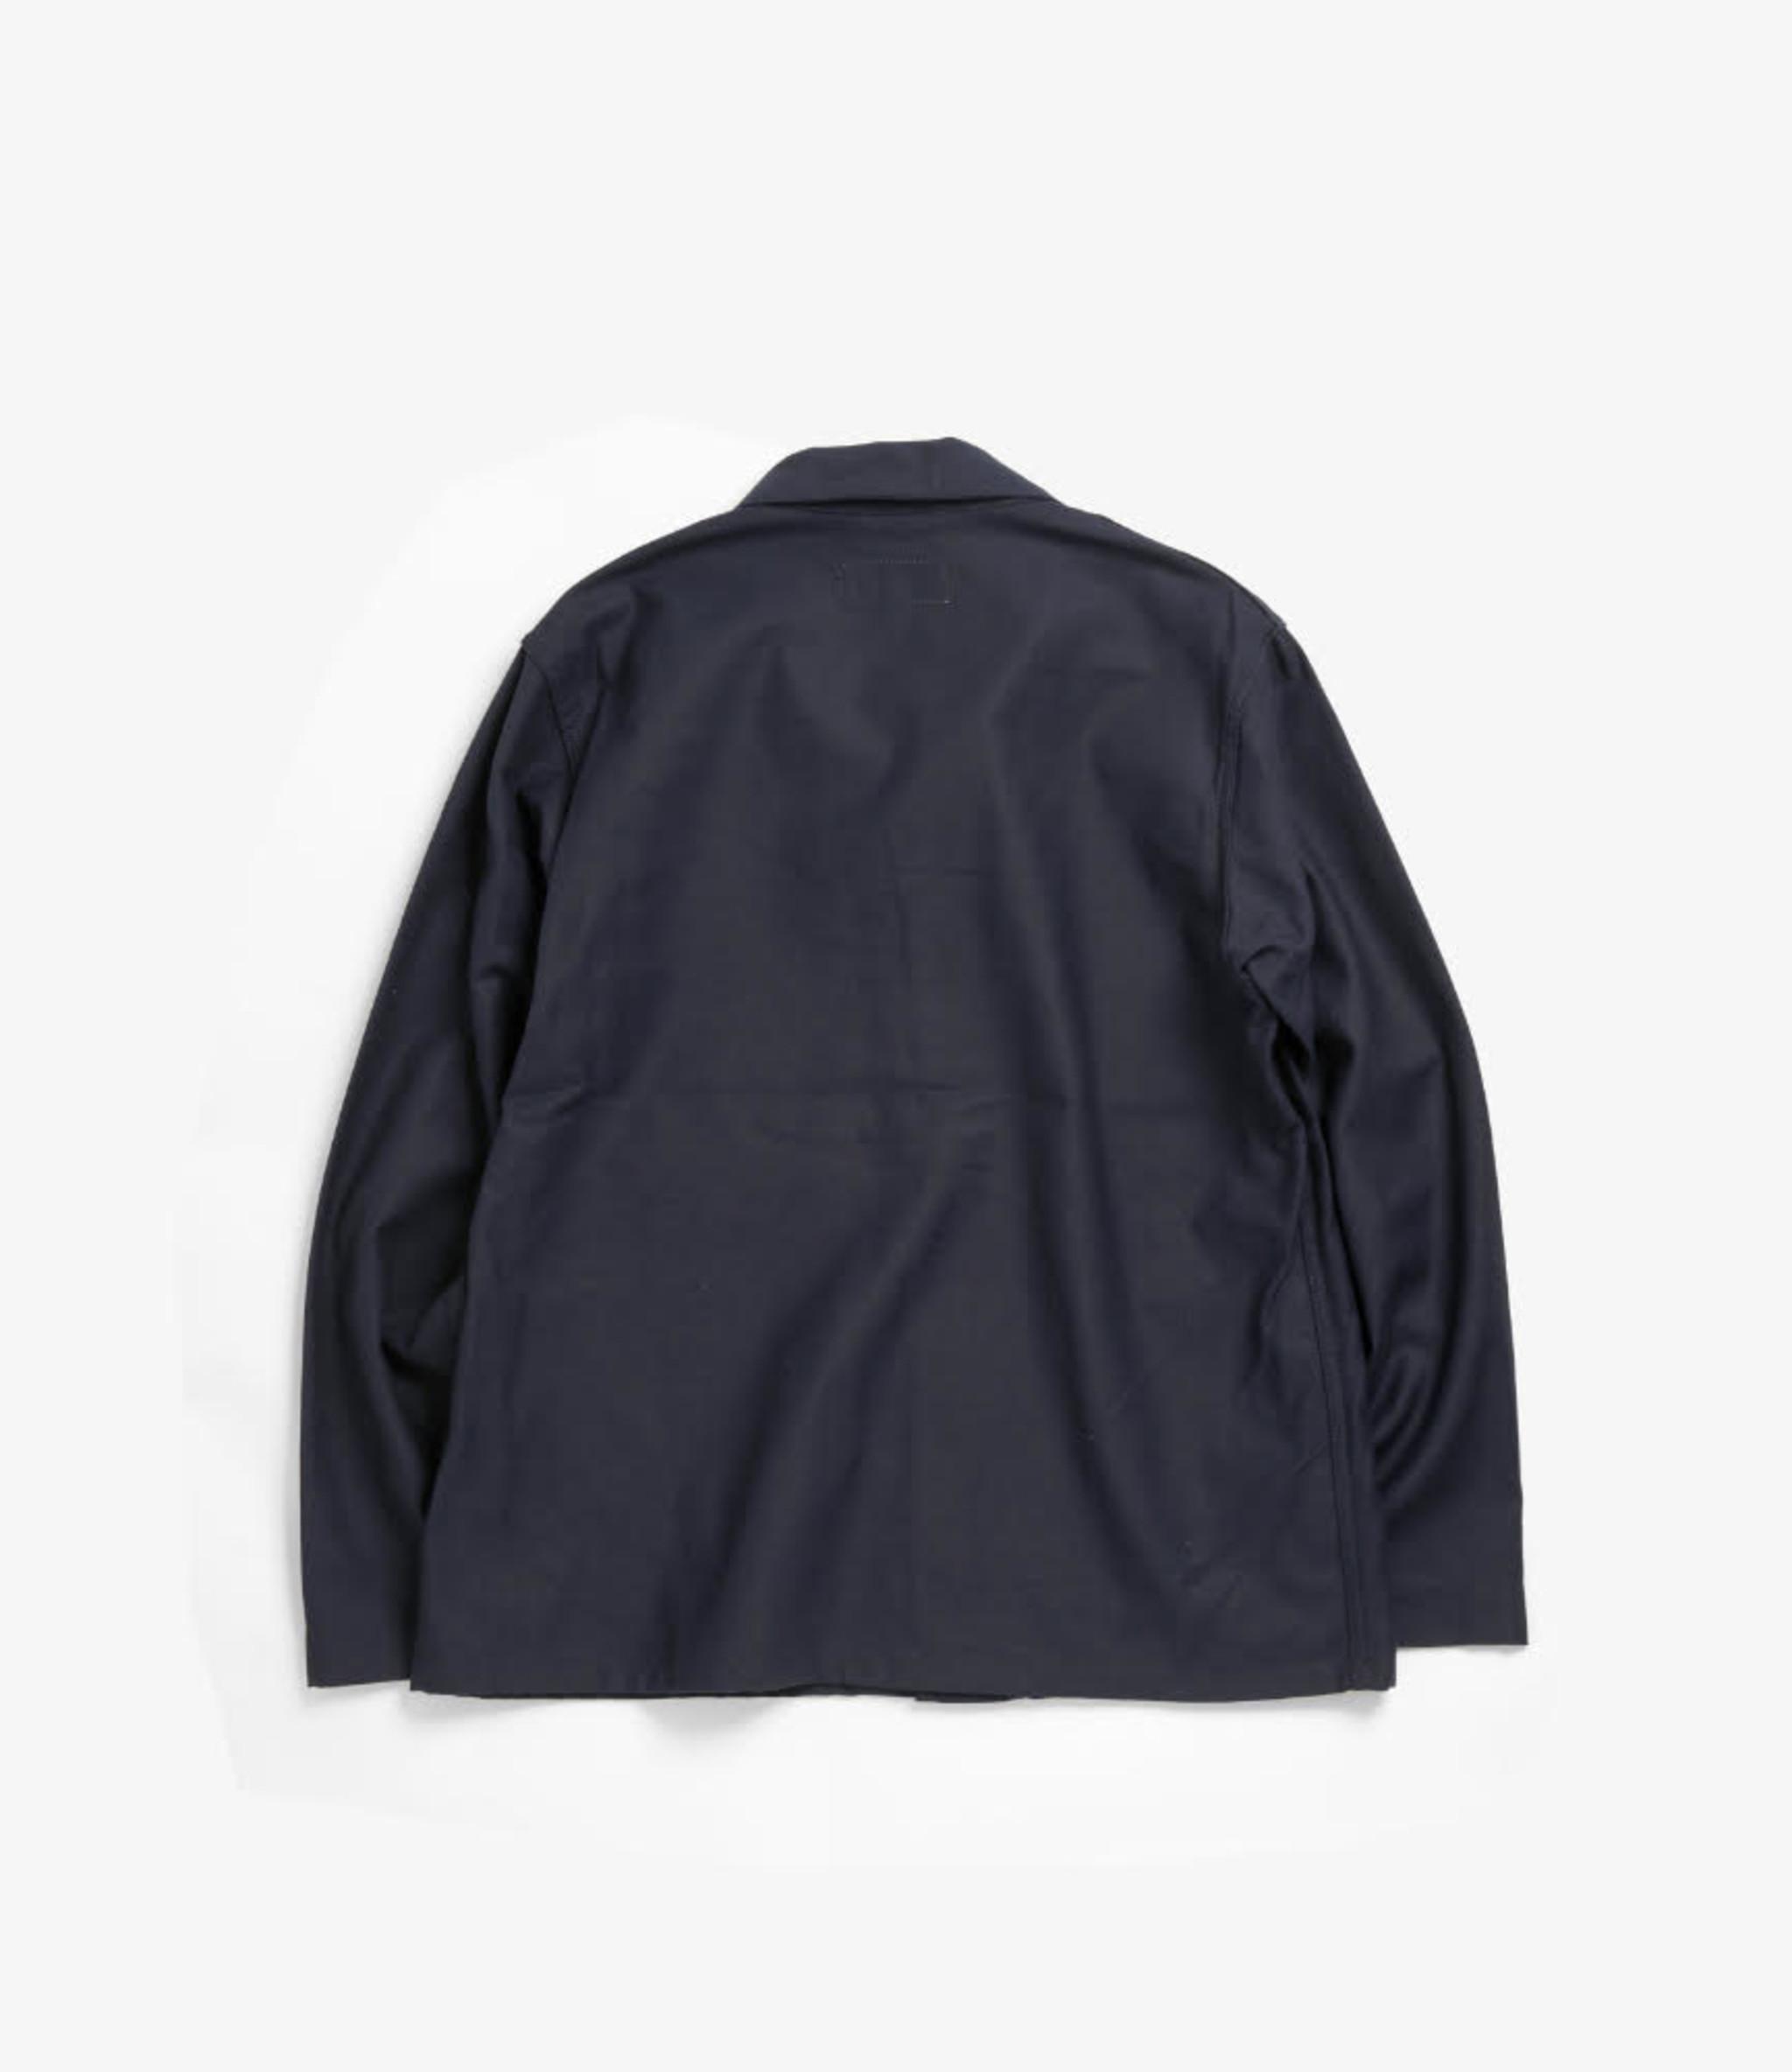 Workaday by Engineered Garments Utility Jacket - Dark Navy Cotton Reversed Sateen